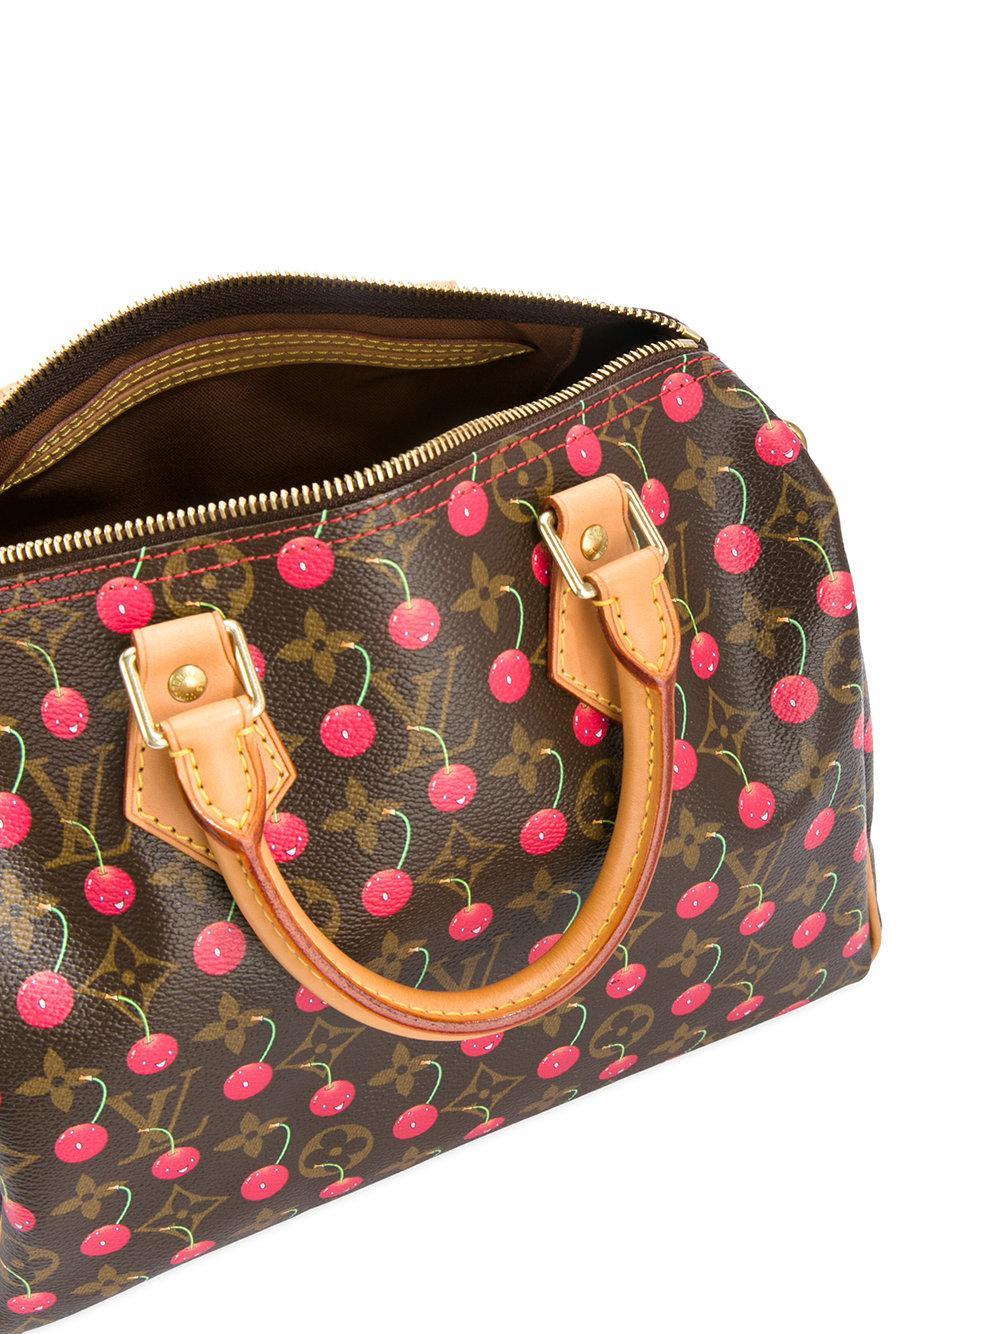 f4790374ea52 Lyst - Louis Vuitton Speedy 25 Cherry Monogram Bag in Brown